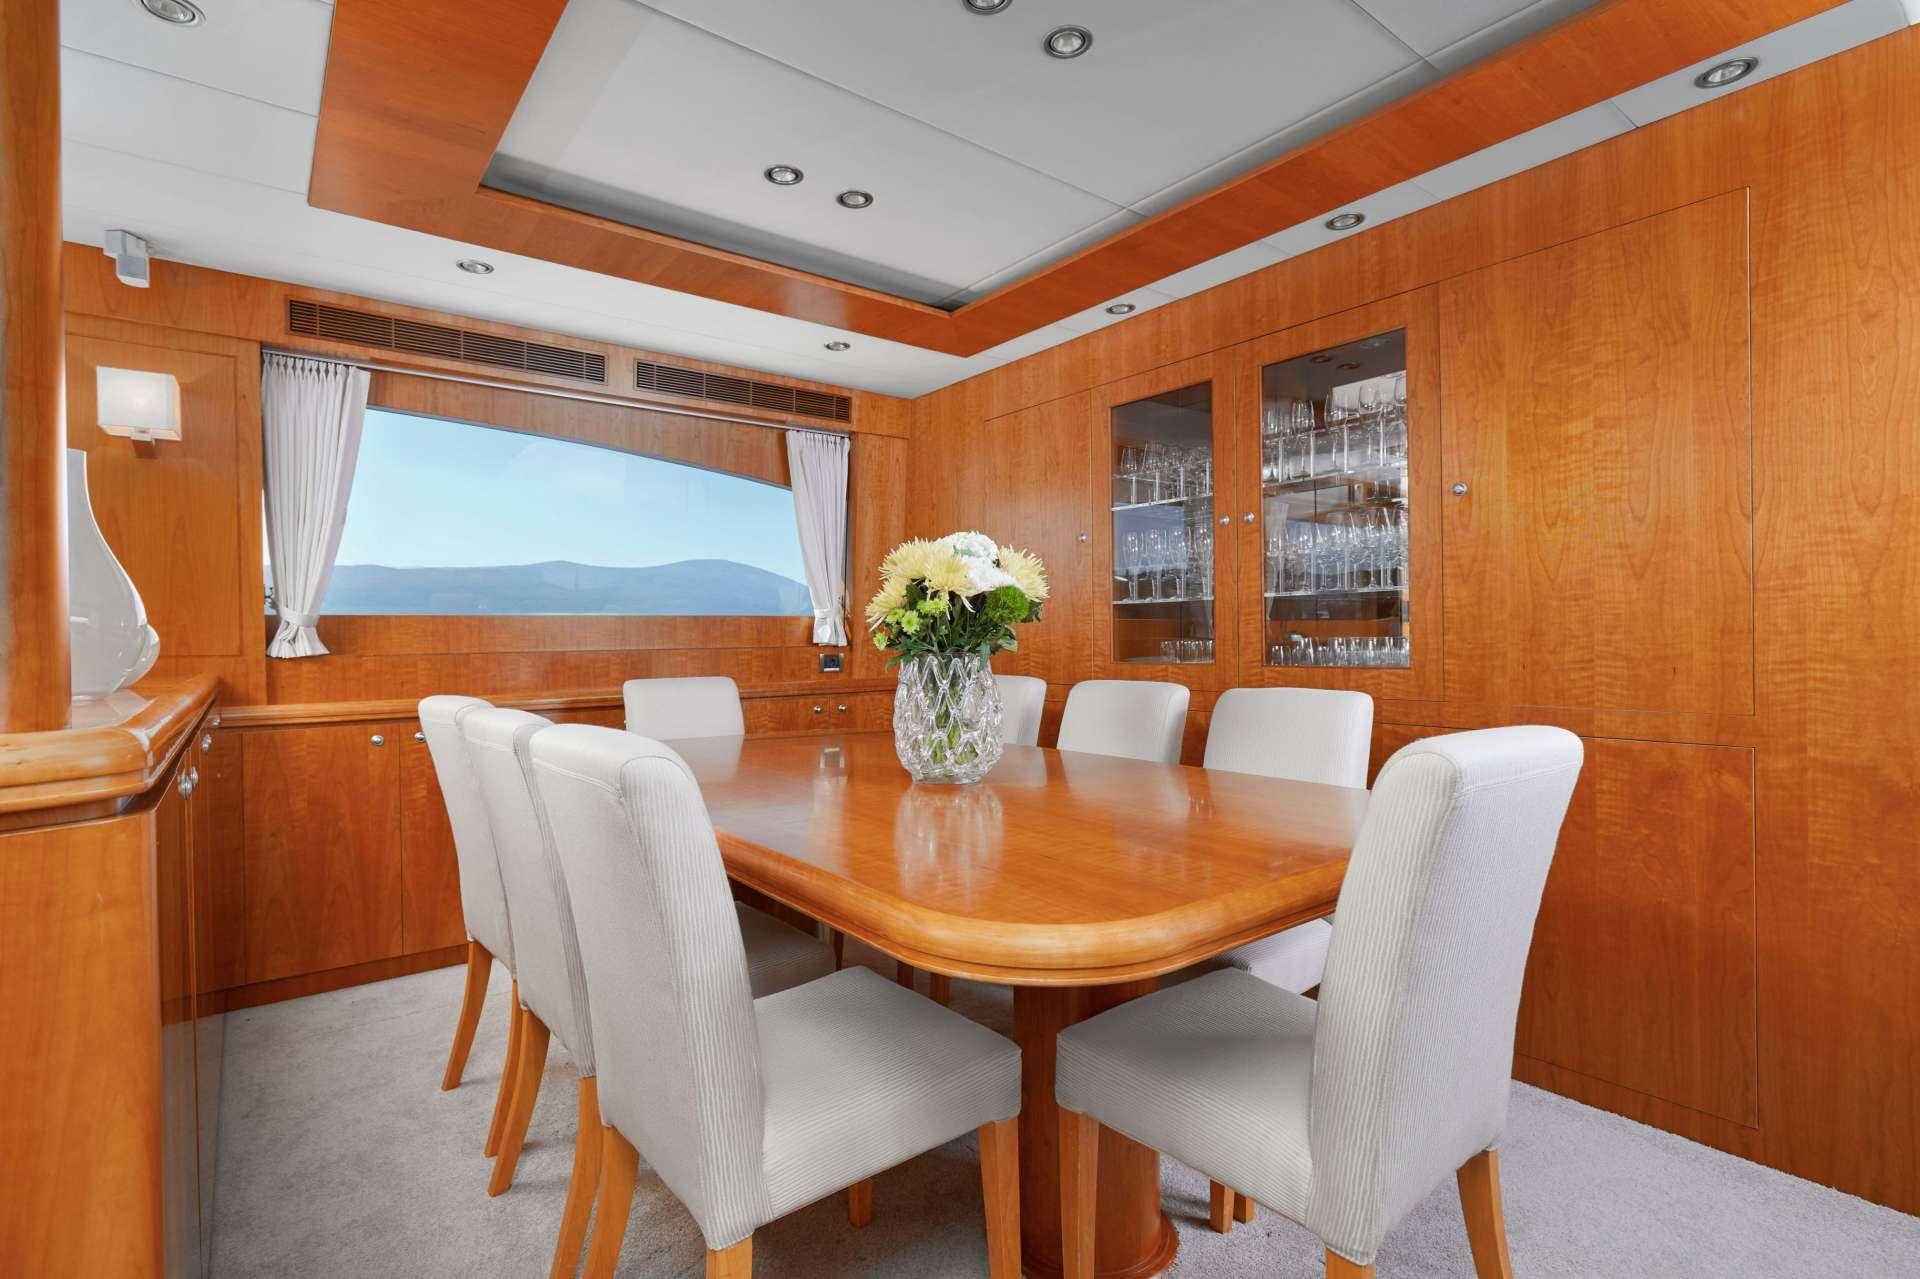 Power Yacht 'Power', 10 PAX, 5 Crew, 97.00 Ft, 29.00 Meters, Built 2009, Horizon, Refit Year 2018